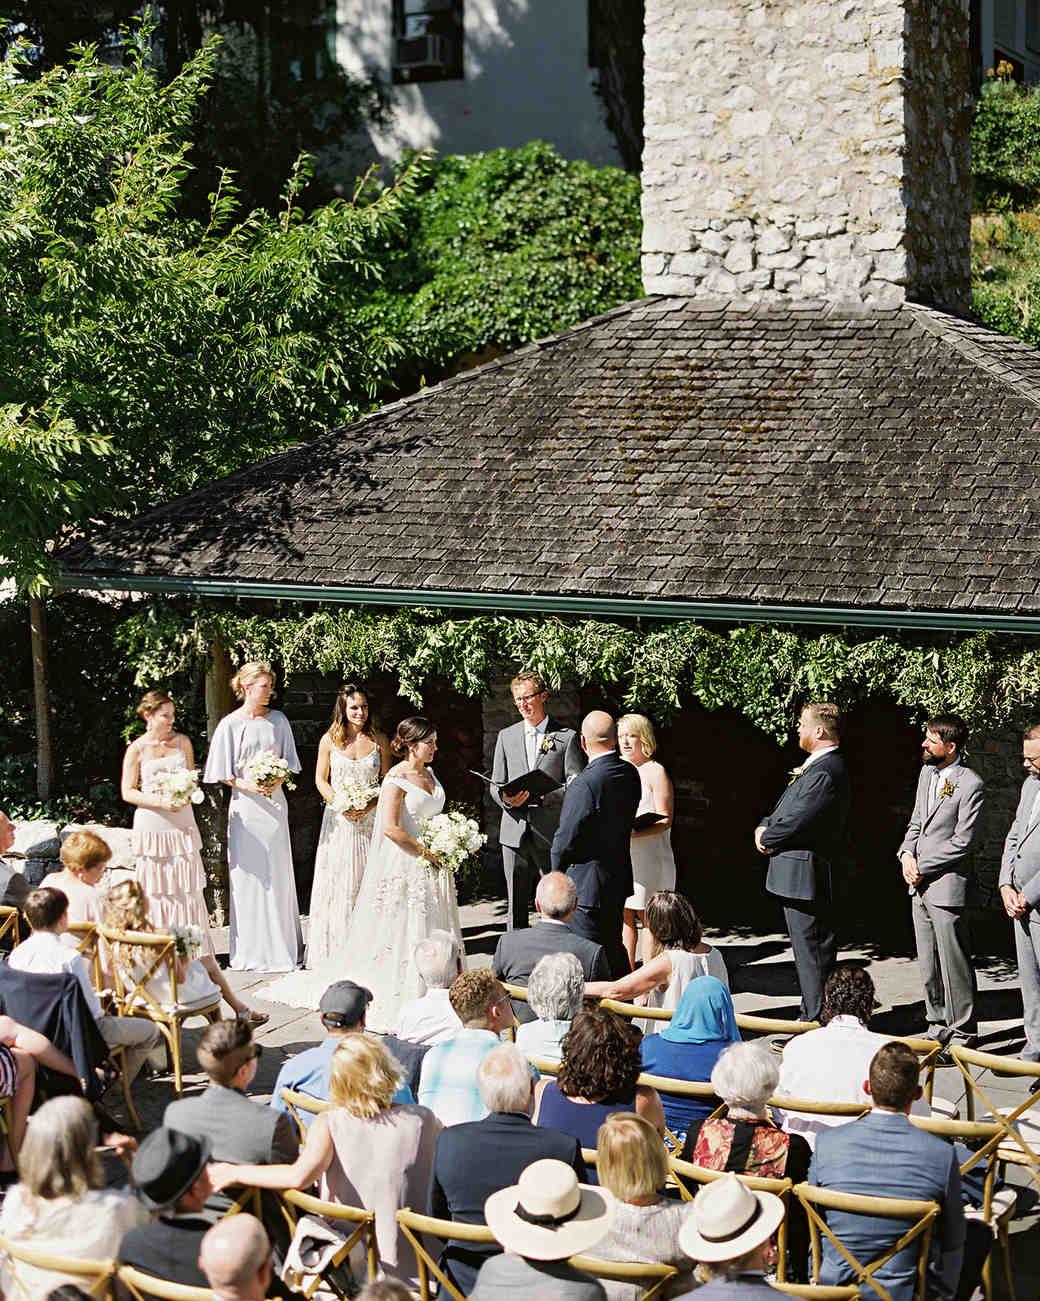 cassandra jason wedding outdoor ceremony